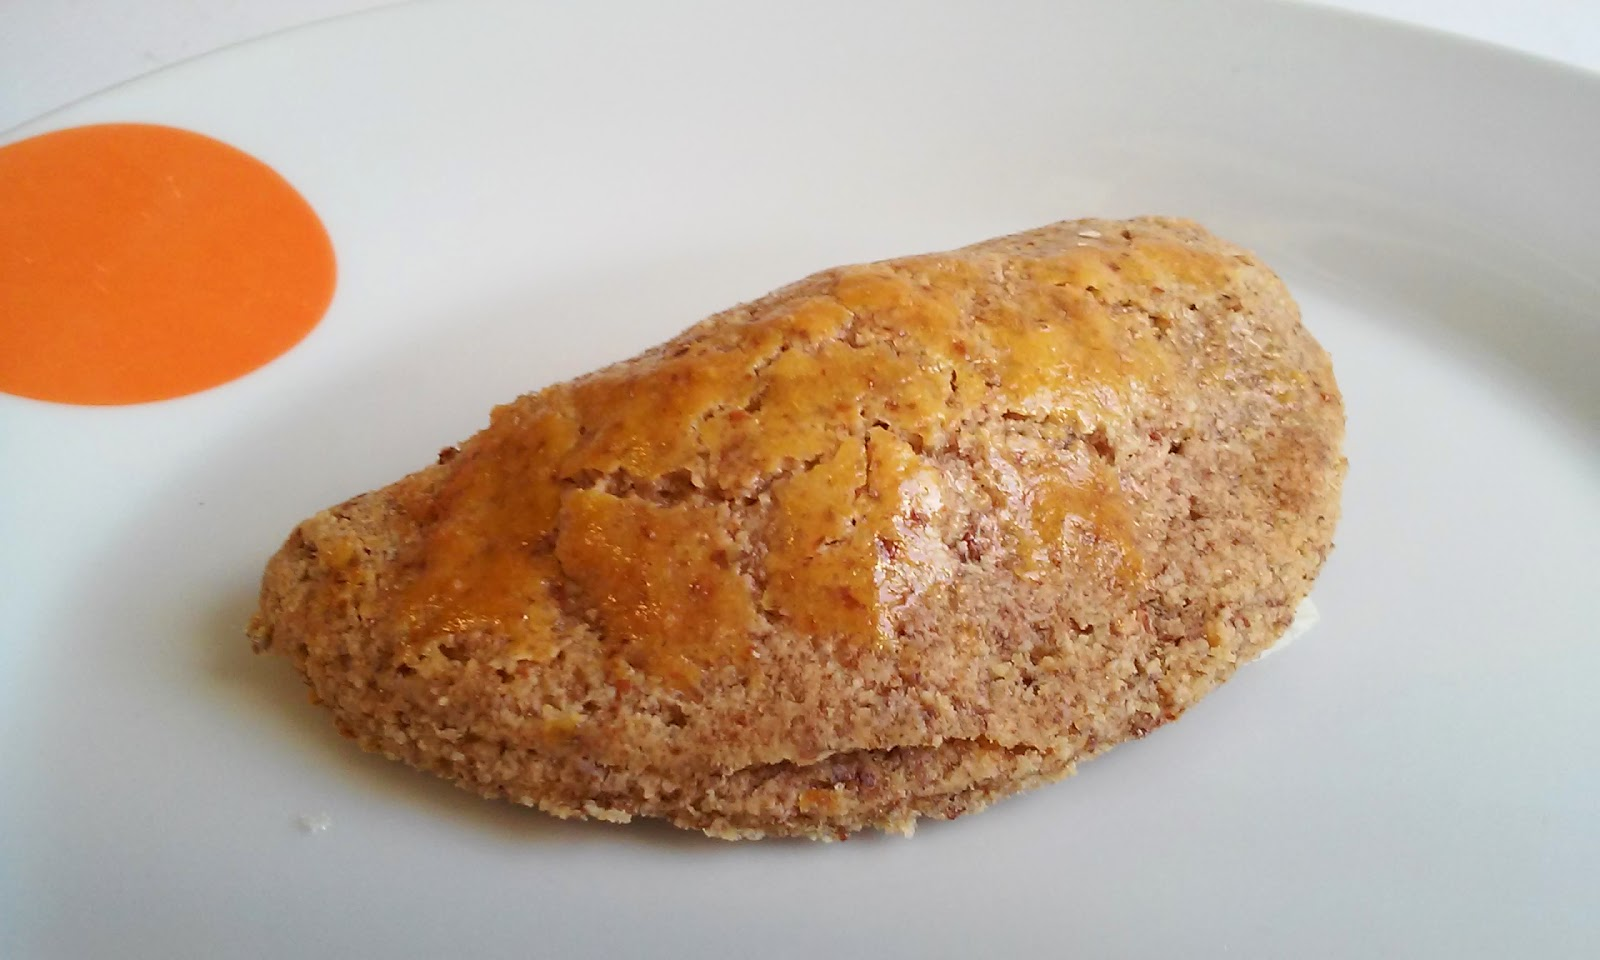 un pastelito